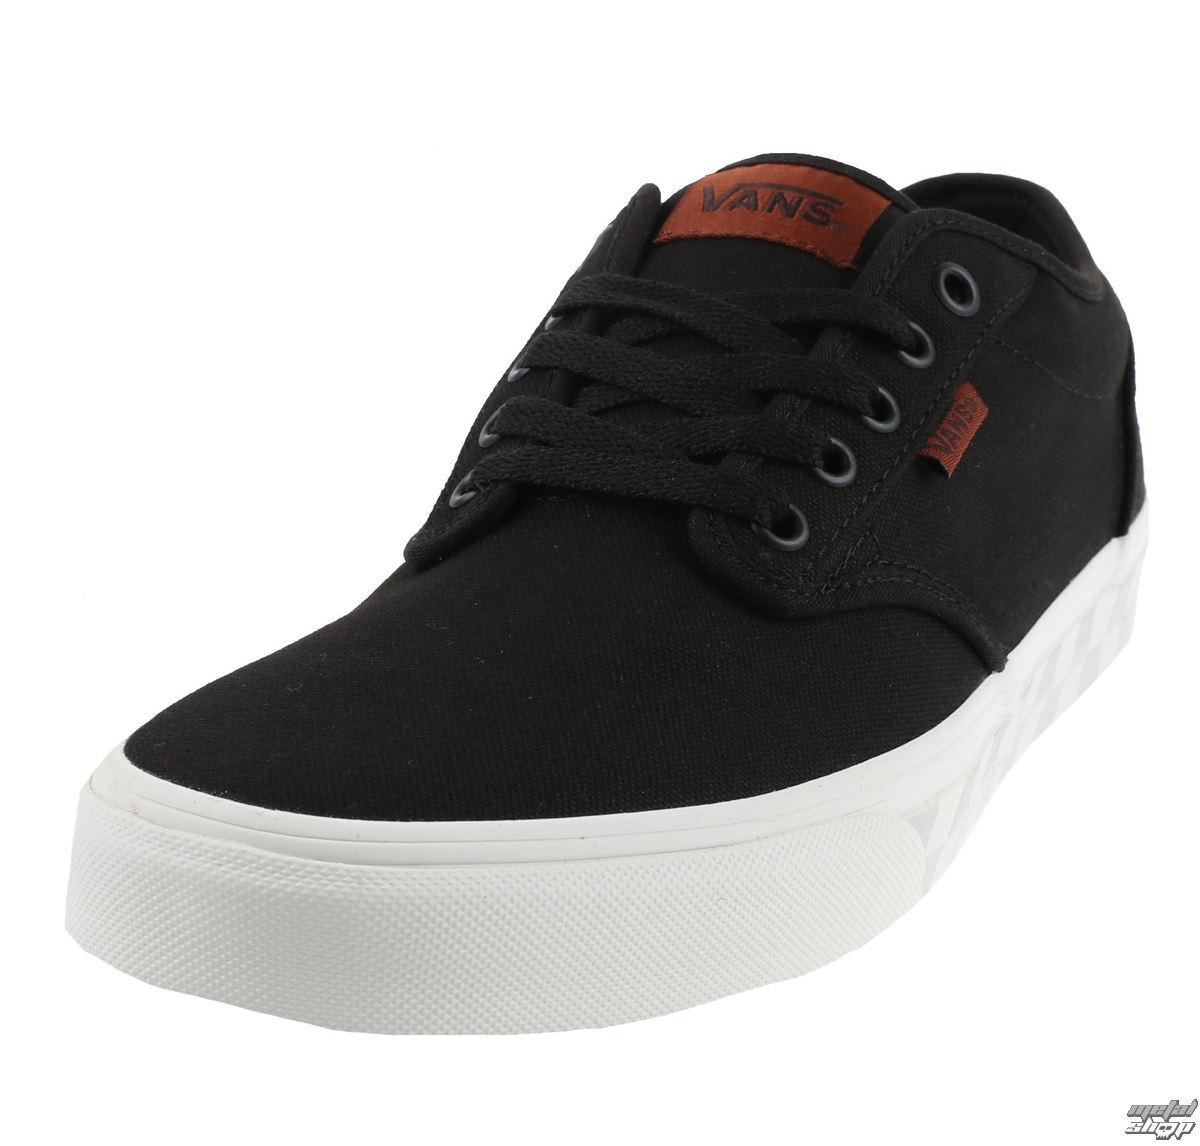 260776b368 topánky VANS - ATWOOD (CHECK FOX) - VA327LMF0 - metalshop.sk